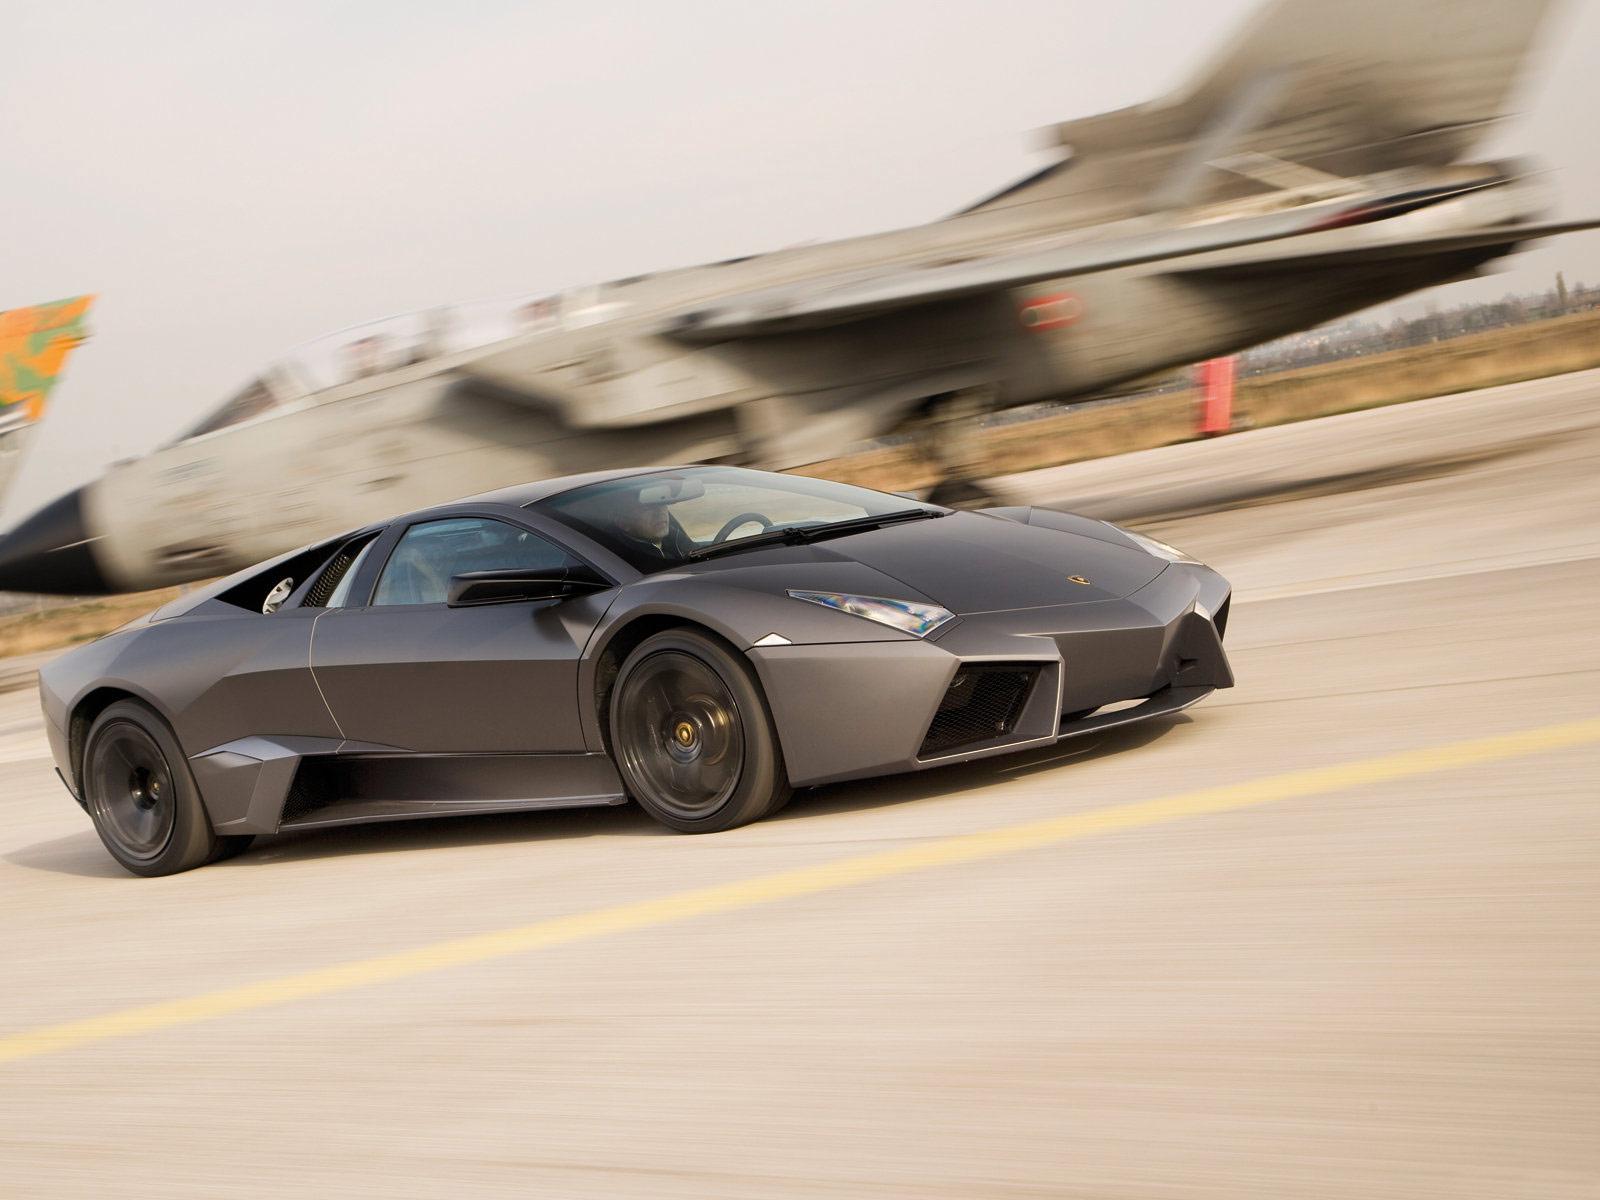 2008 Lamborghini Reventon Car Accident Lawyers Info